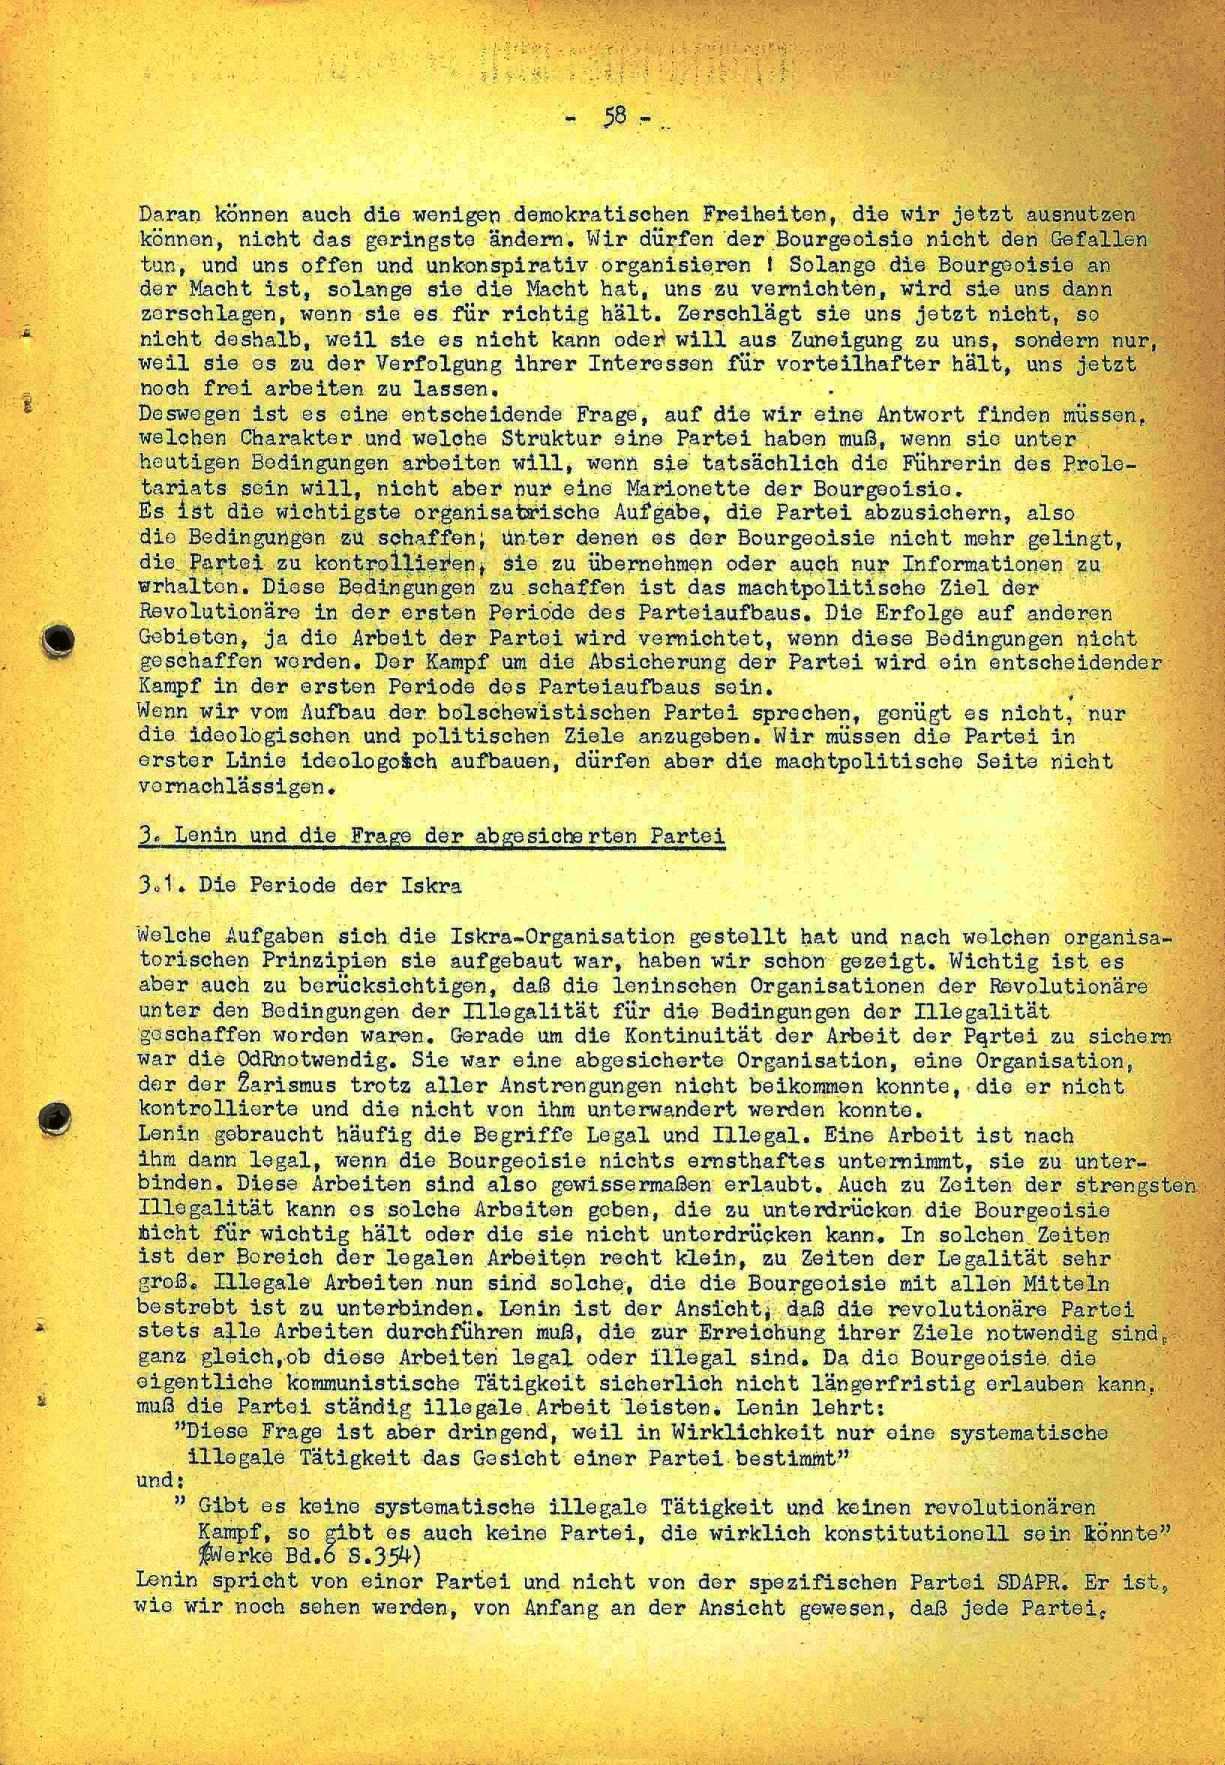 Weinfurth058